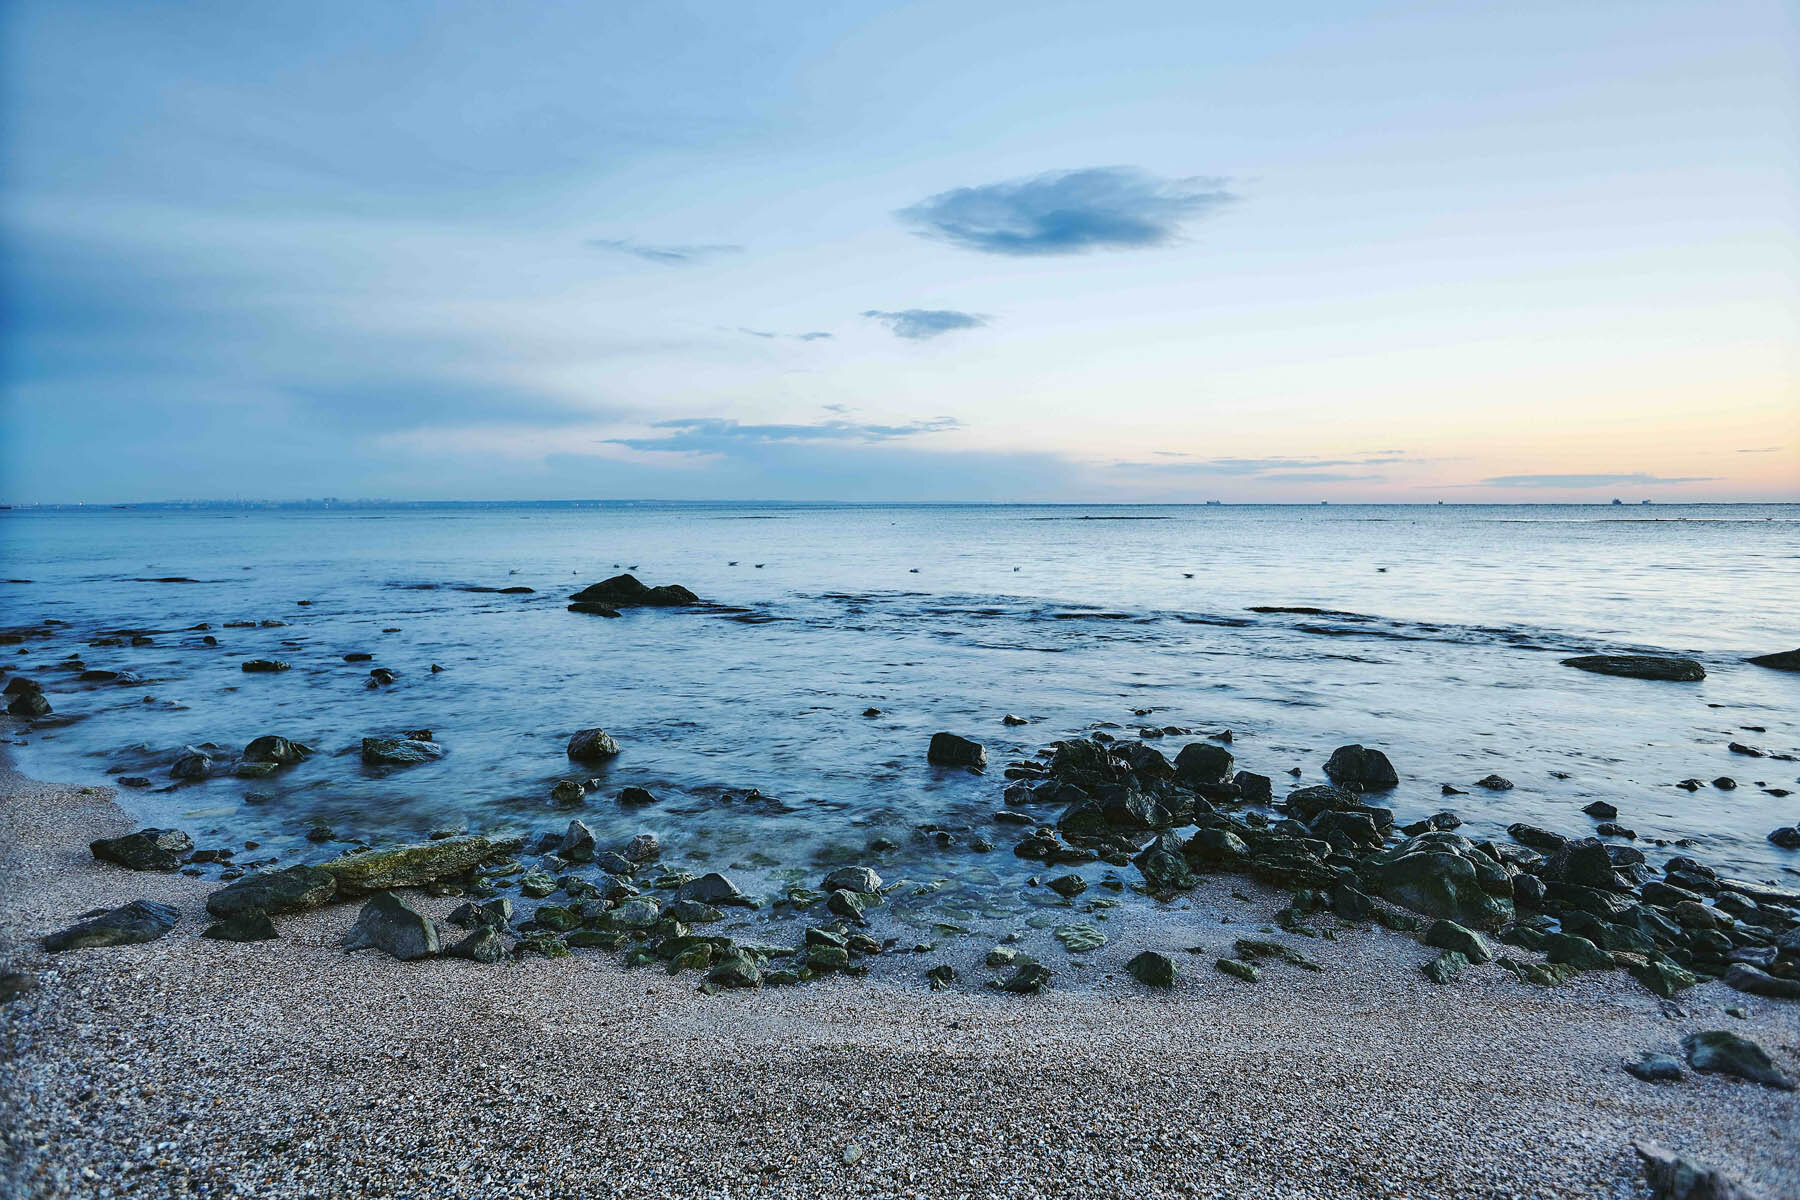 PlateART Duschrückwand mit Motiv Strand und Meer Kiesstrand